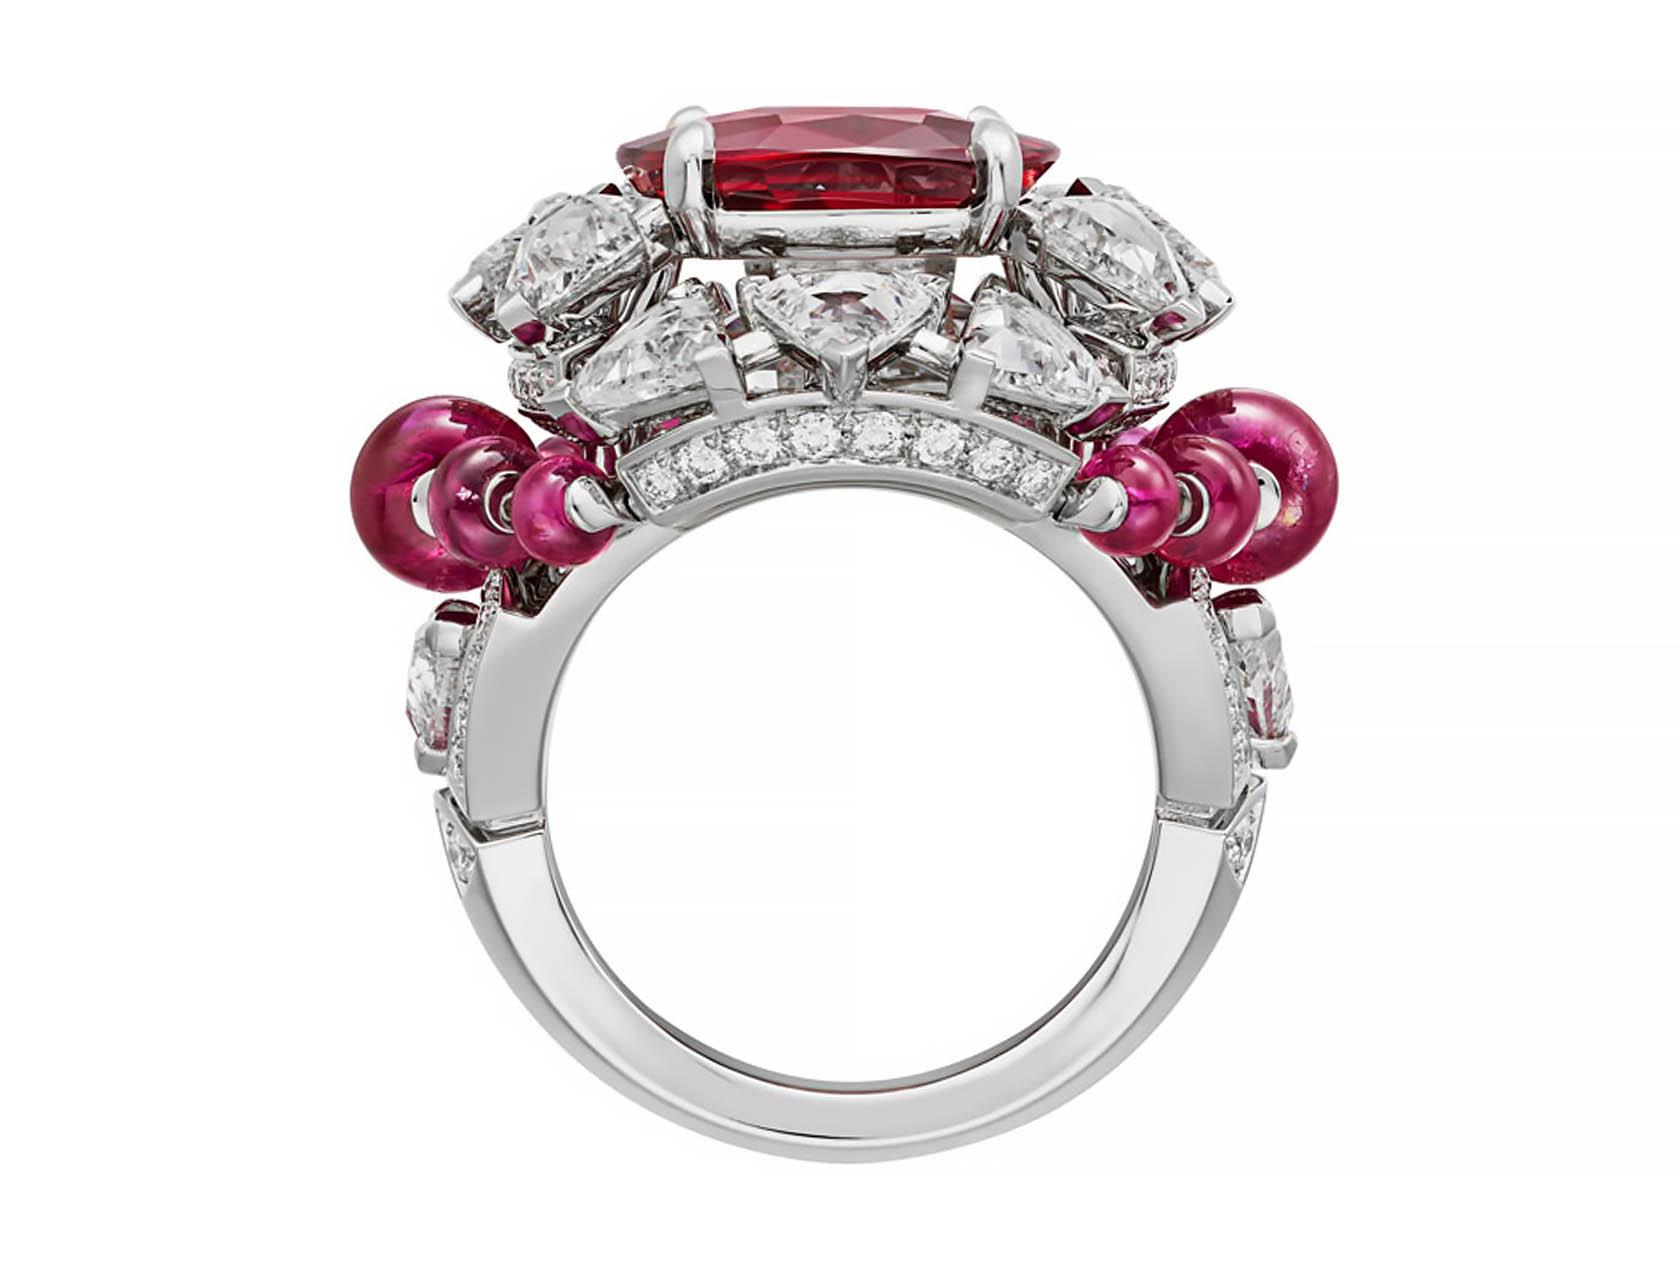 Кольцо Phaan от Cartier с сиамским рубином и белыми бриллиантами